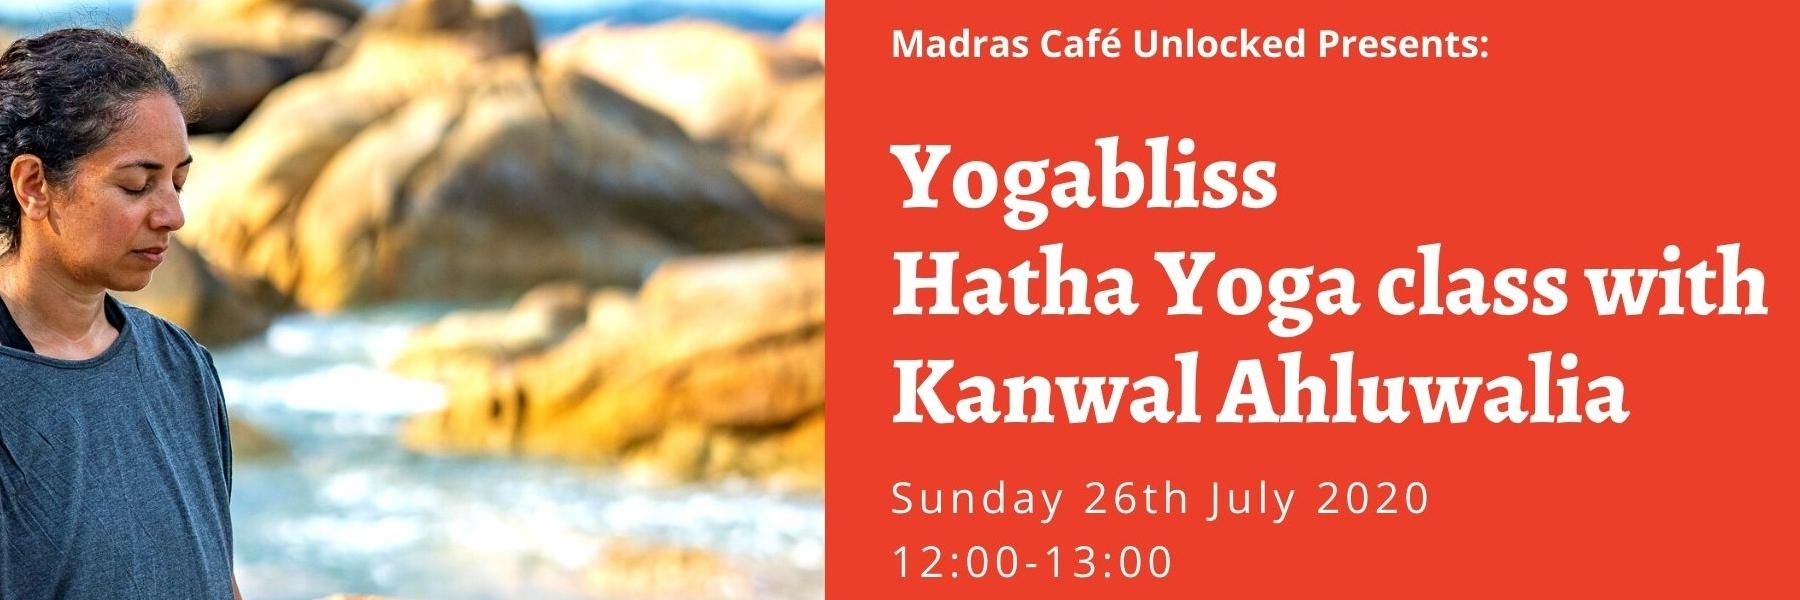 Madras Cafe Unlocked 2020: Yogabliss hatha yoga with Kanwal Ahluwalia